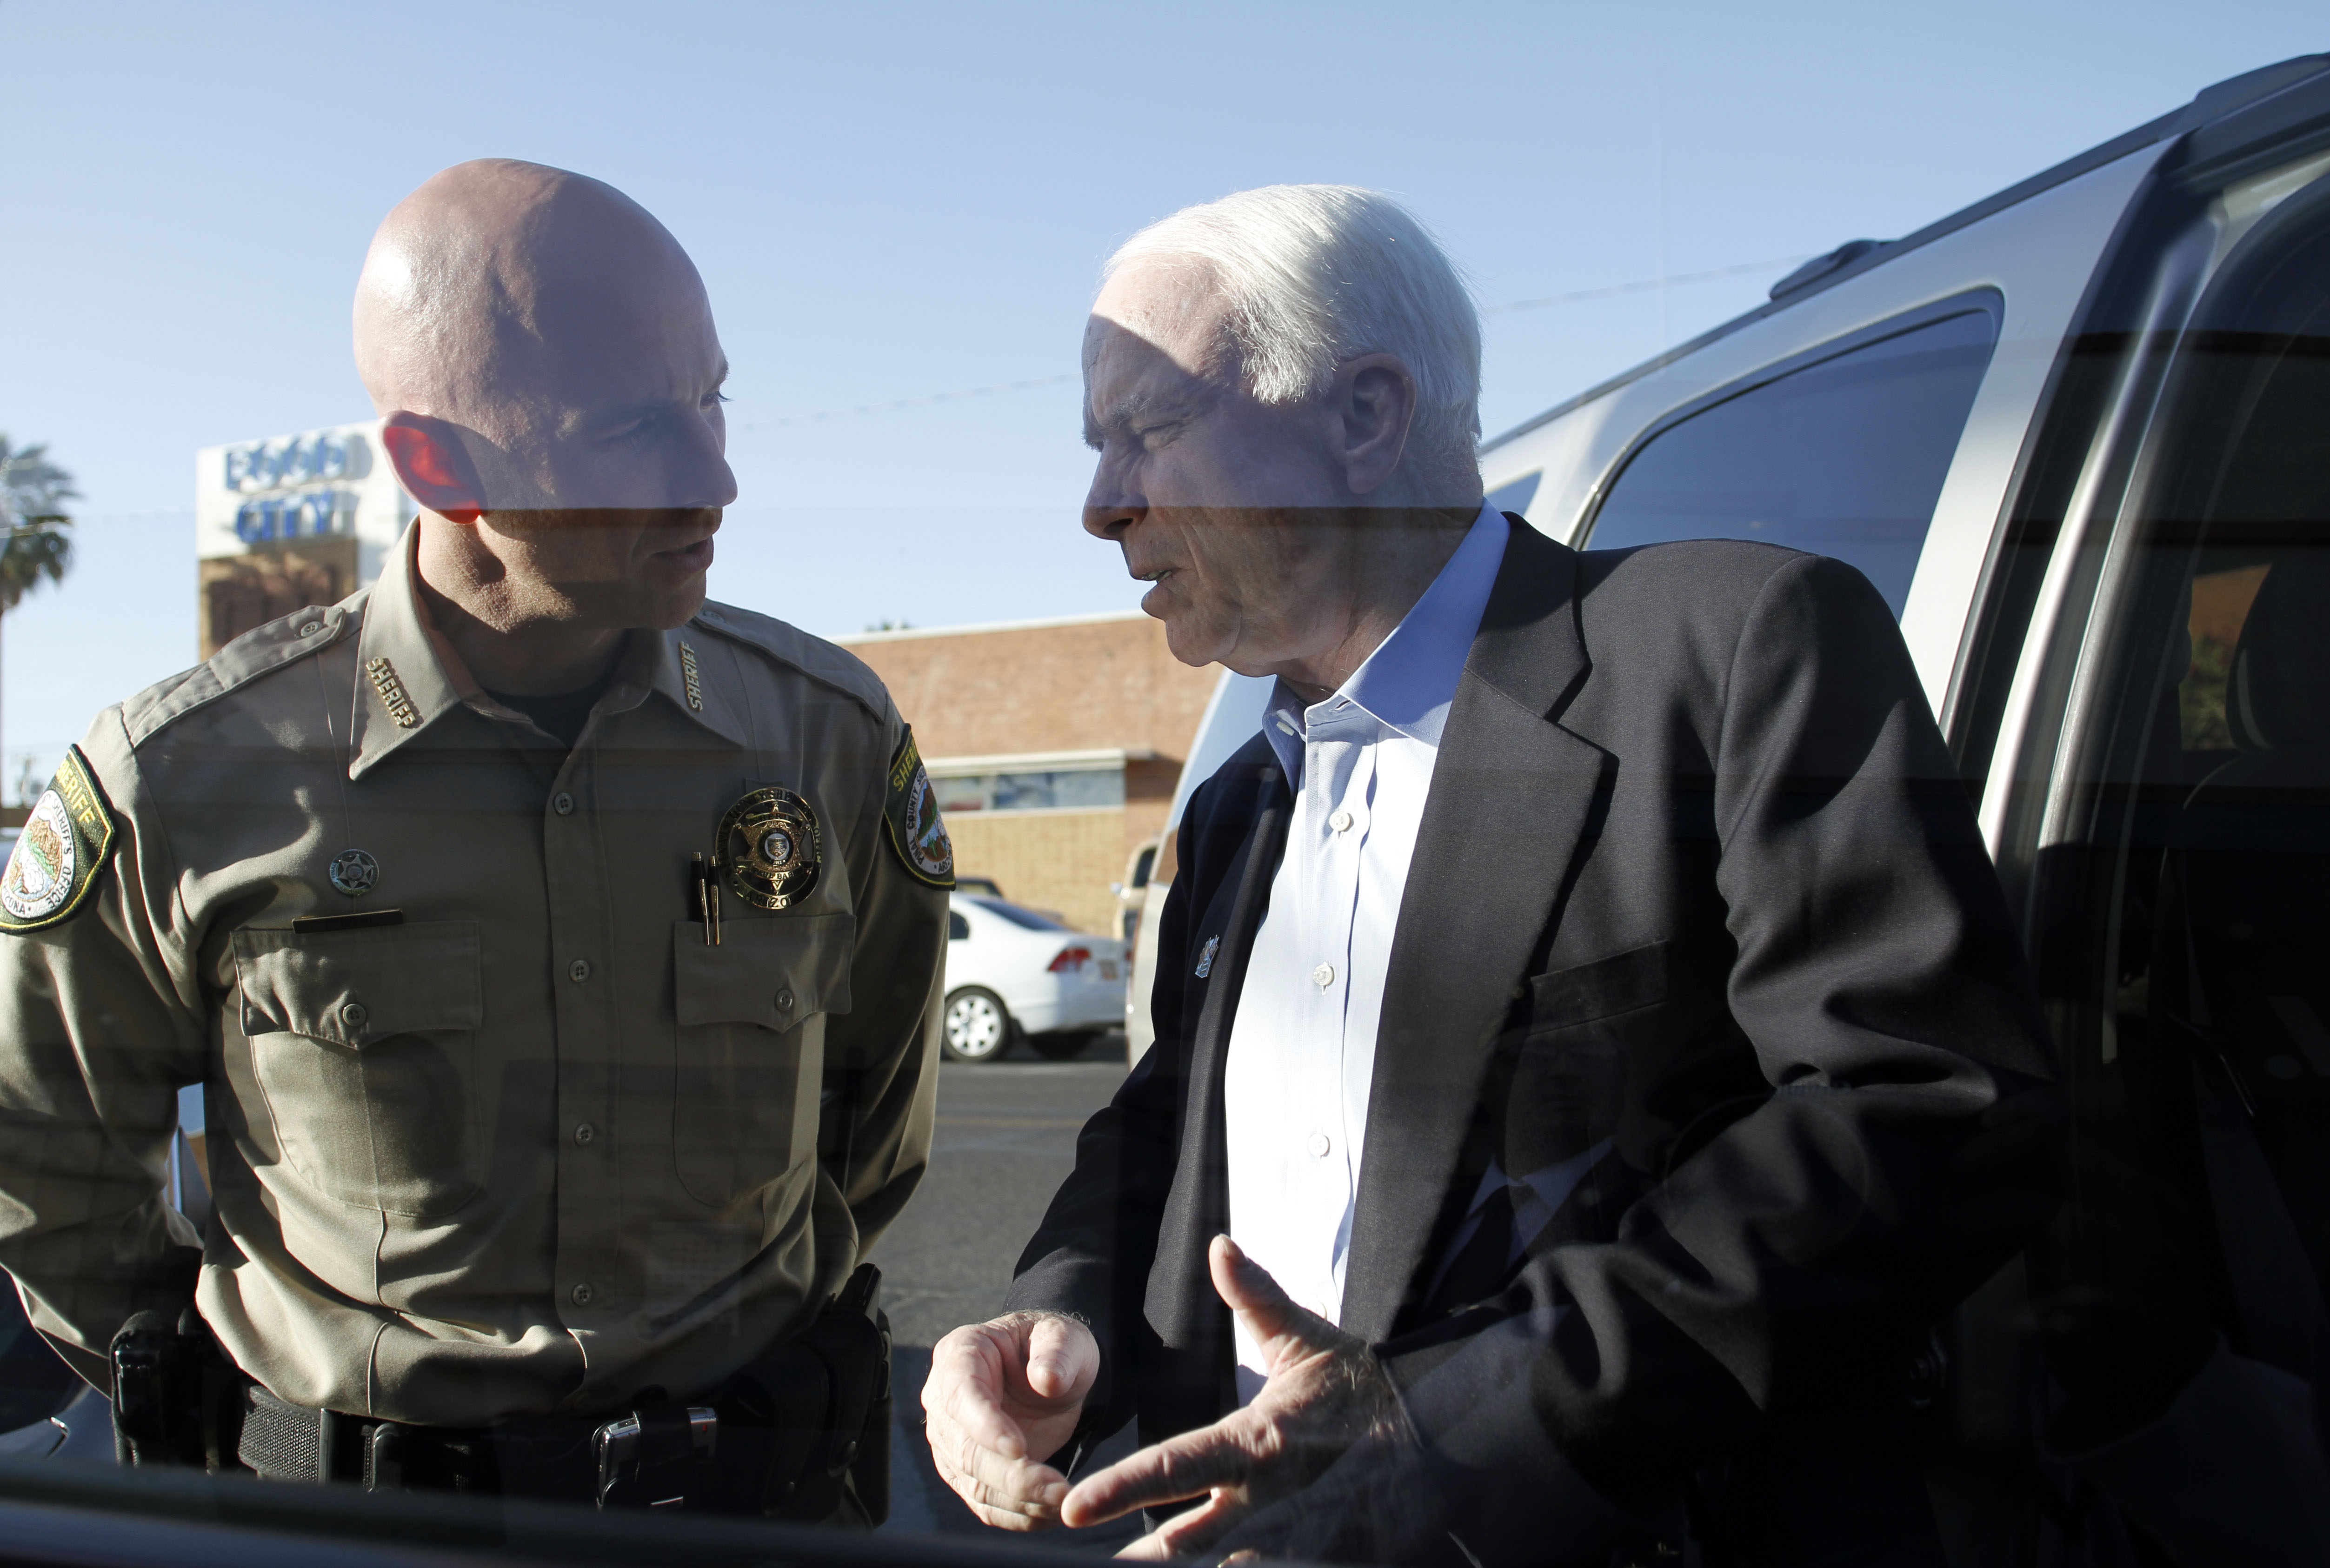 Sheriff Paul Babeu with Senator John McCain. (Facebook)